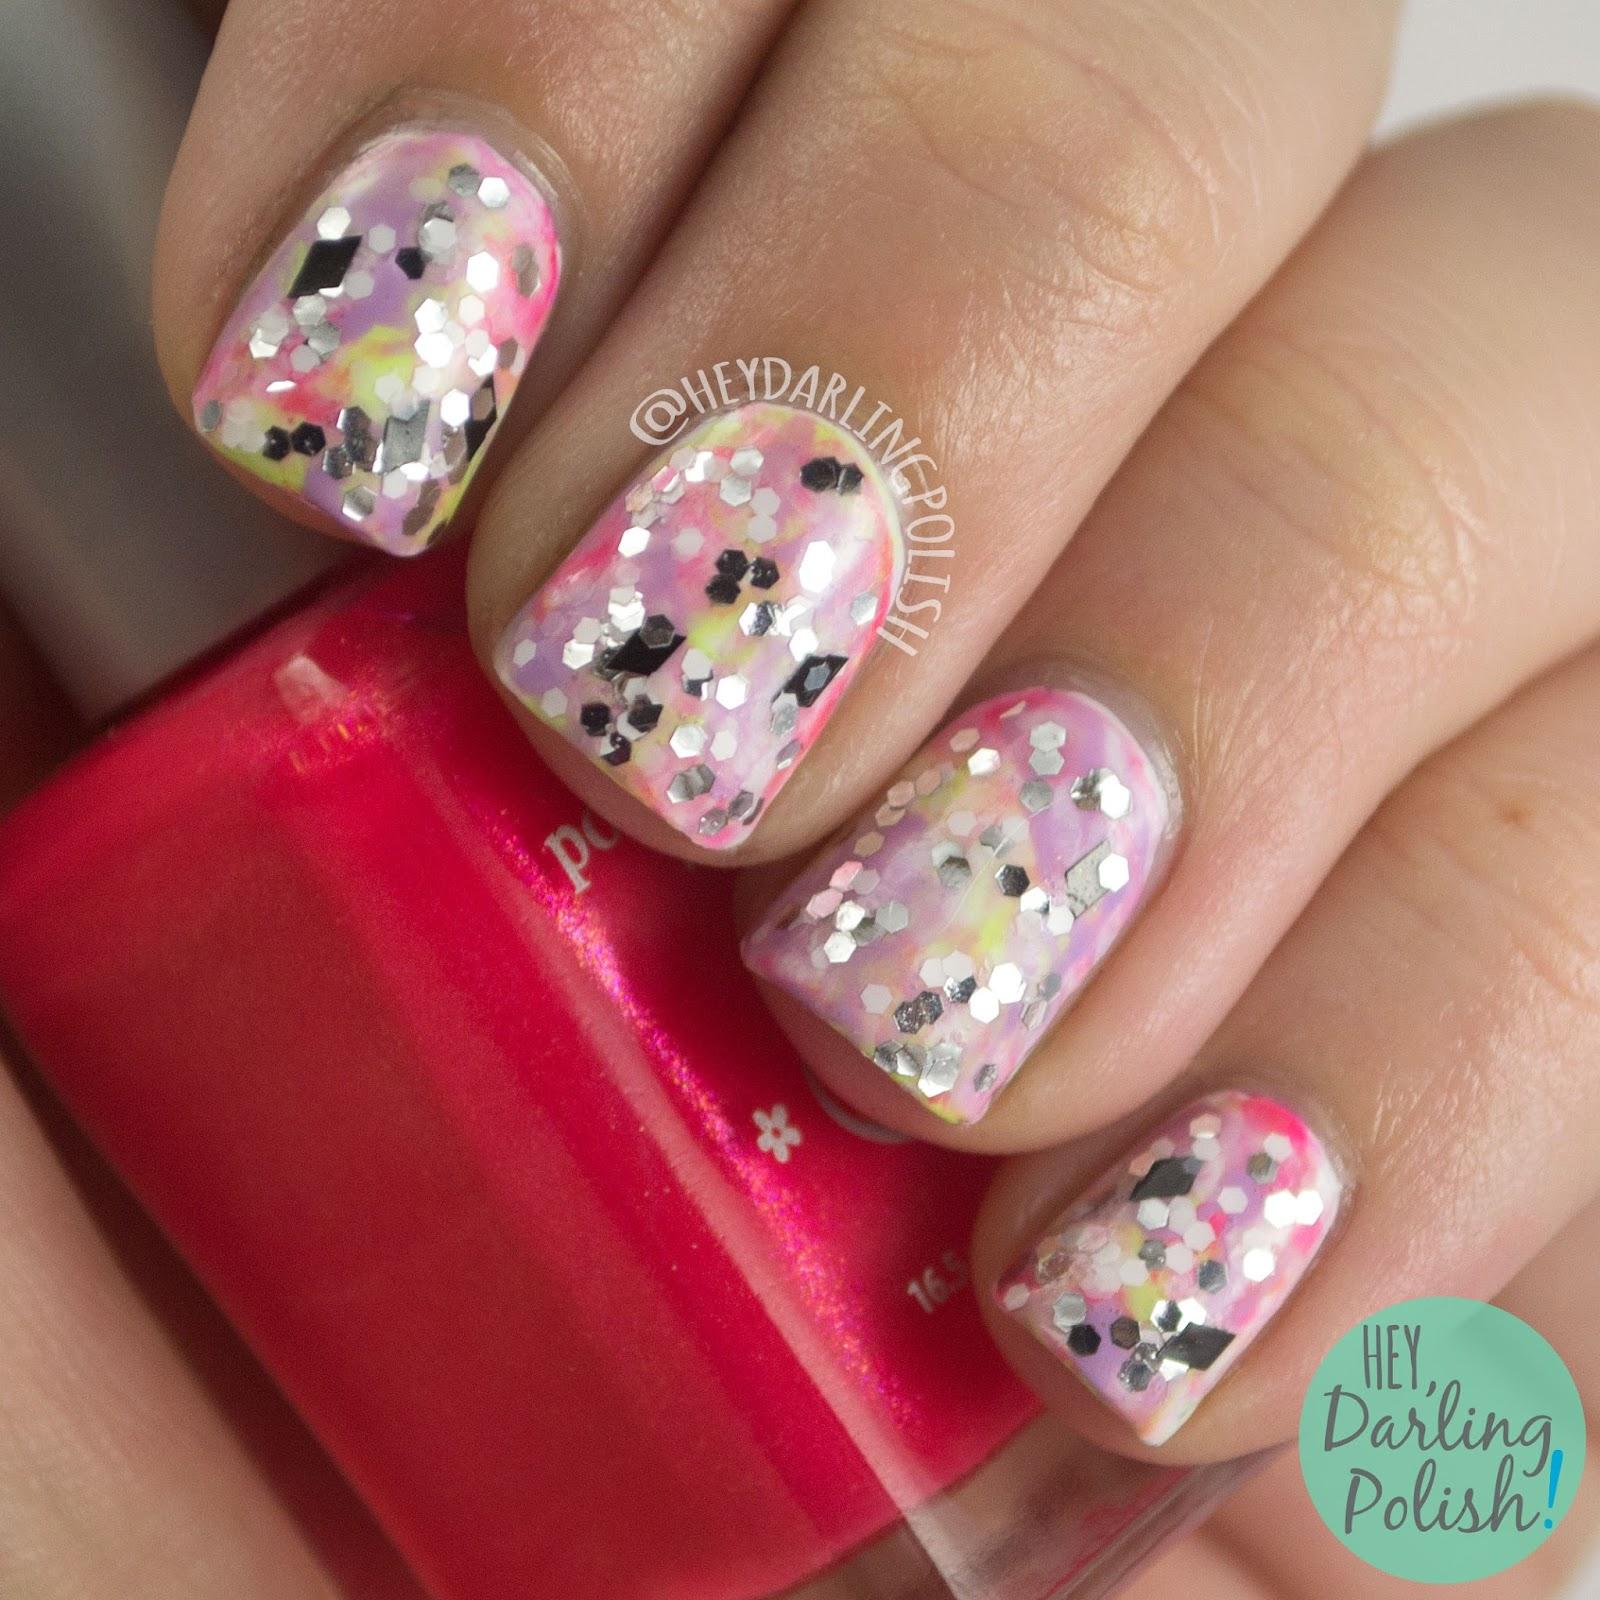 nails, nail art, nail polish, tri polish challenge, glitter, pink, purple, green, hey darling polish